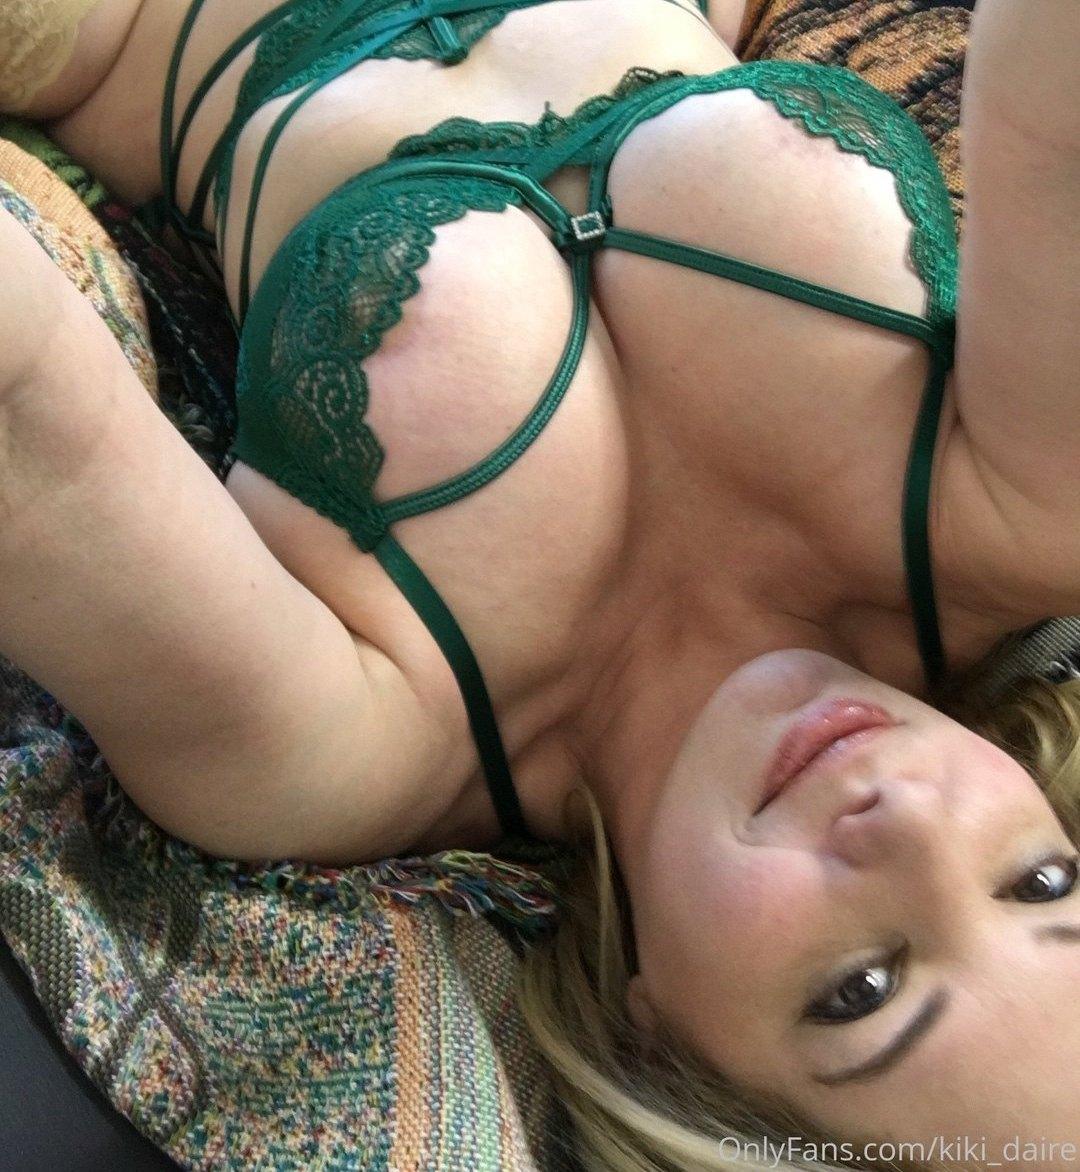 Kiki Daire Kiki Daire Onlyfans Nudes Leaks 0026